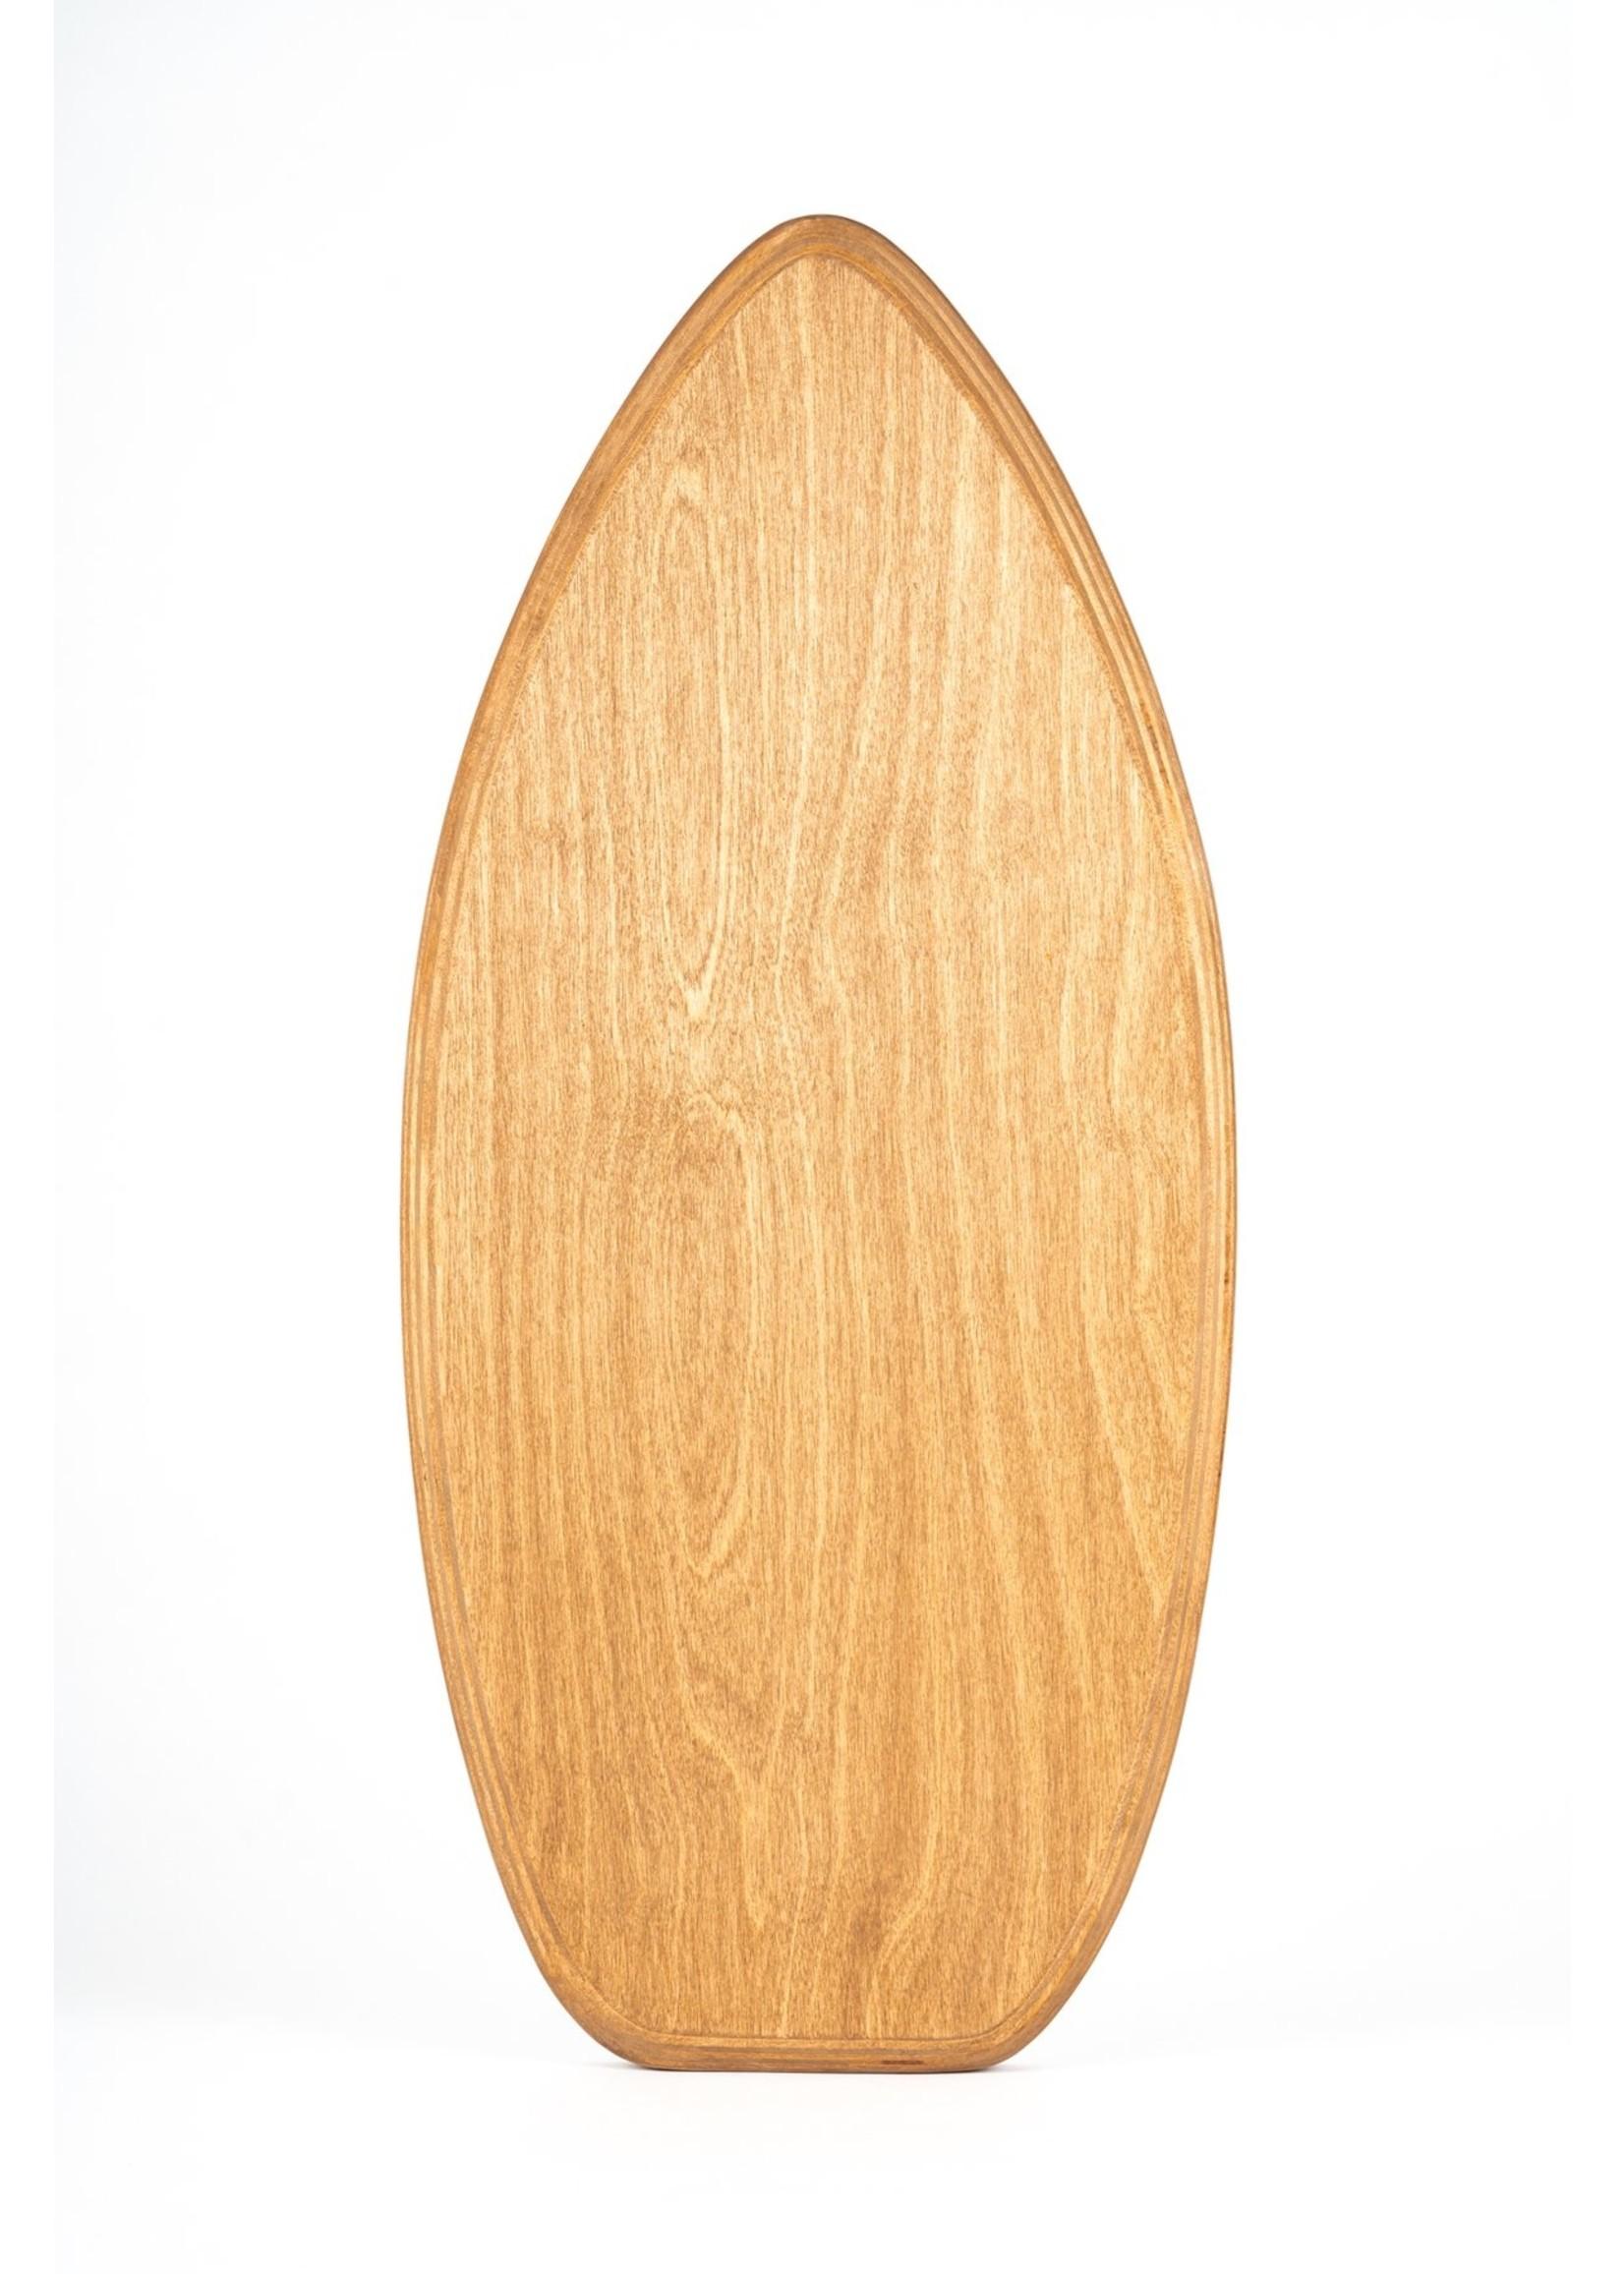 Montreal B-Board SURF SHAPE